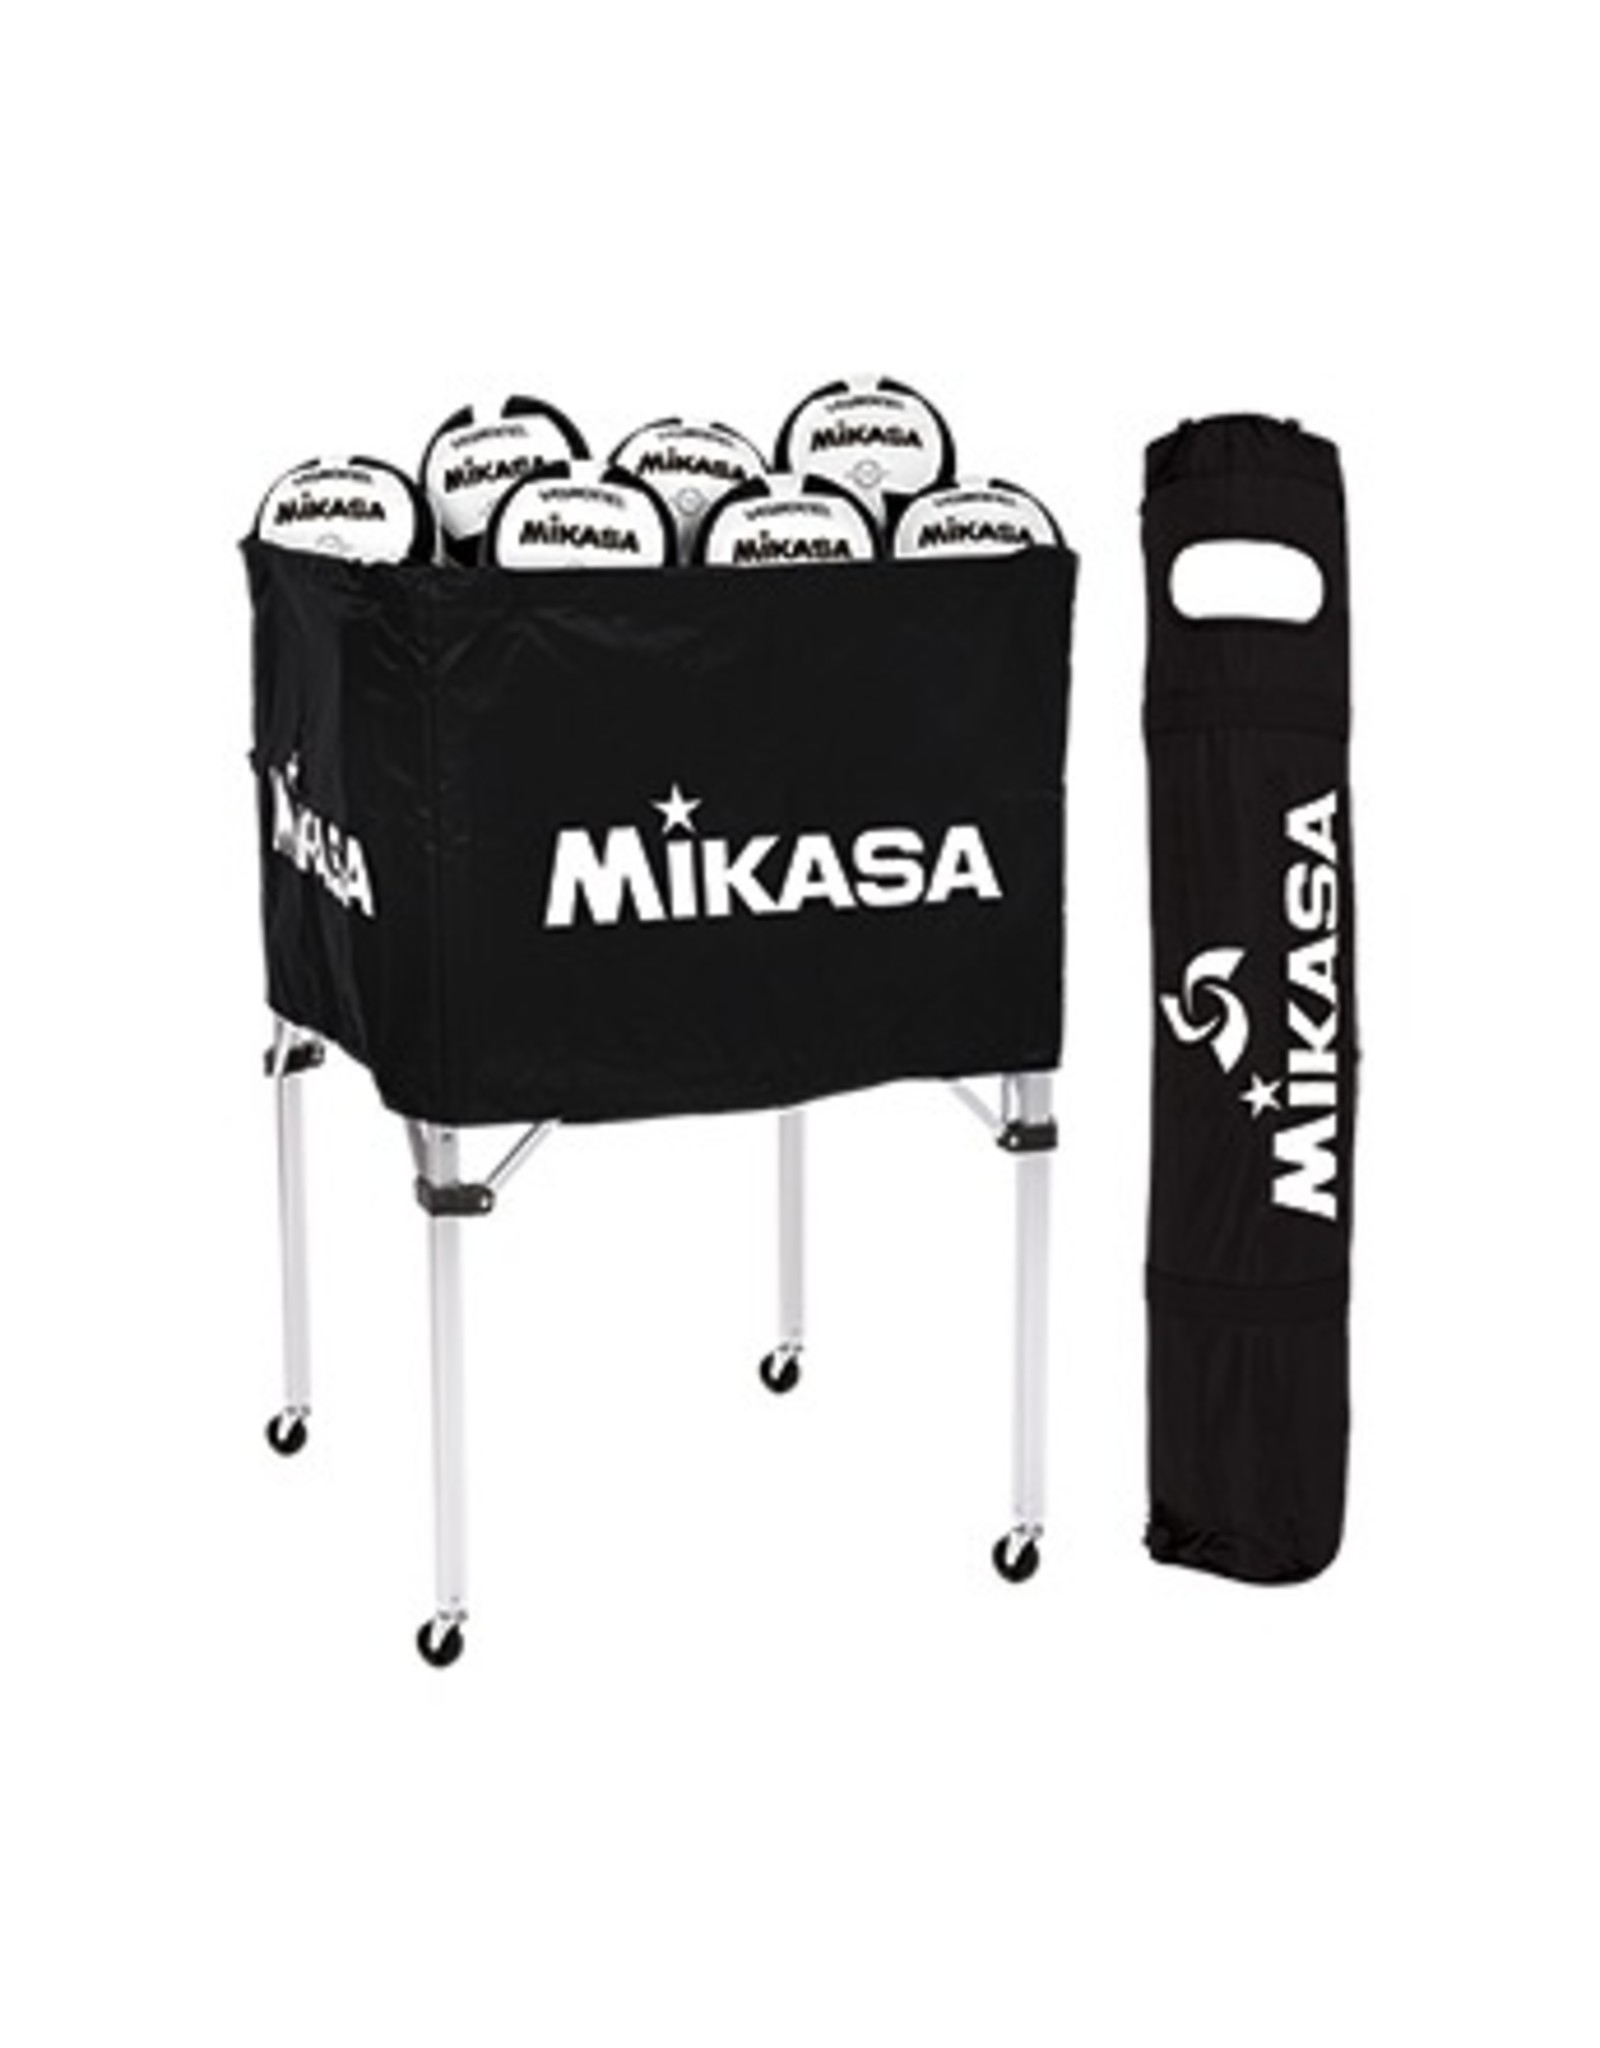 Mikasa Classic Collapsible Ball Cart